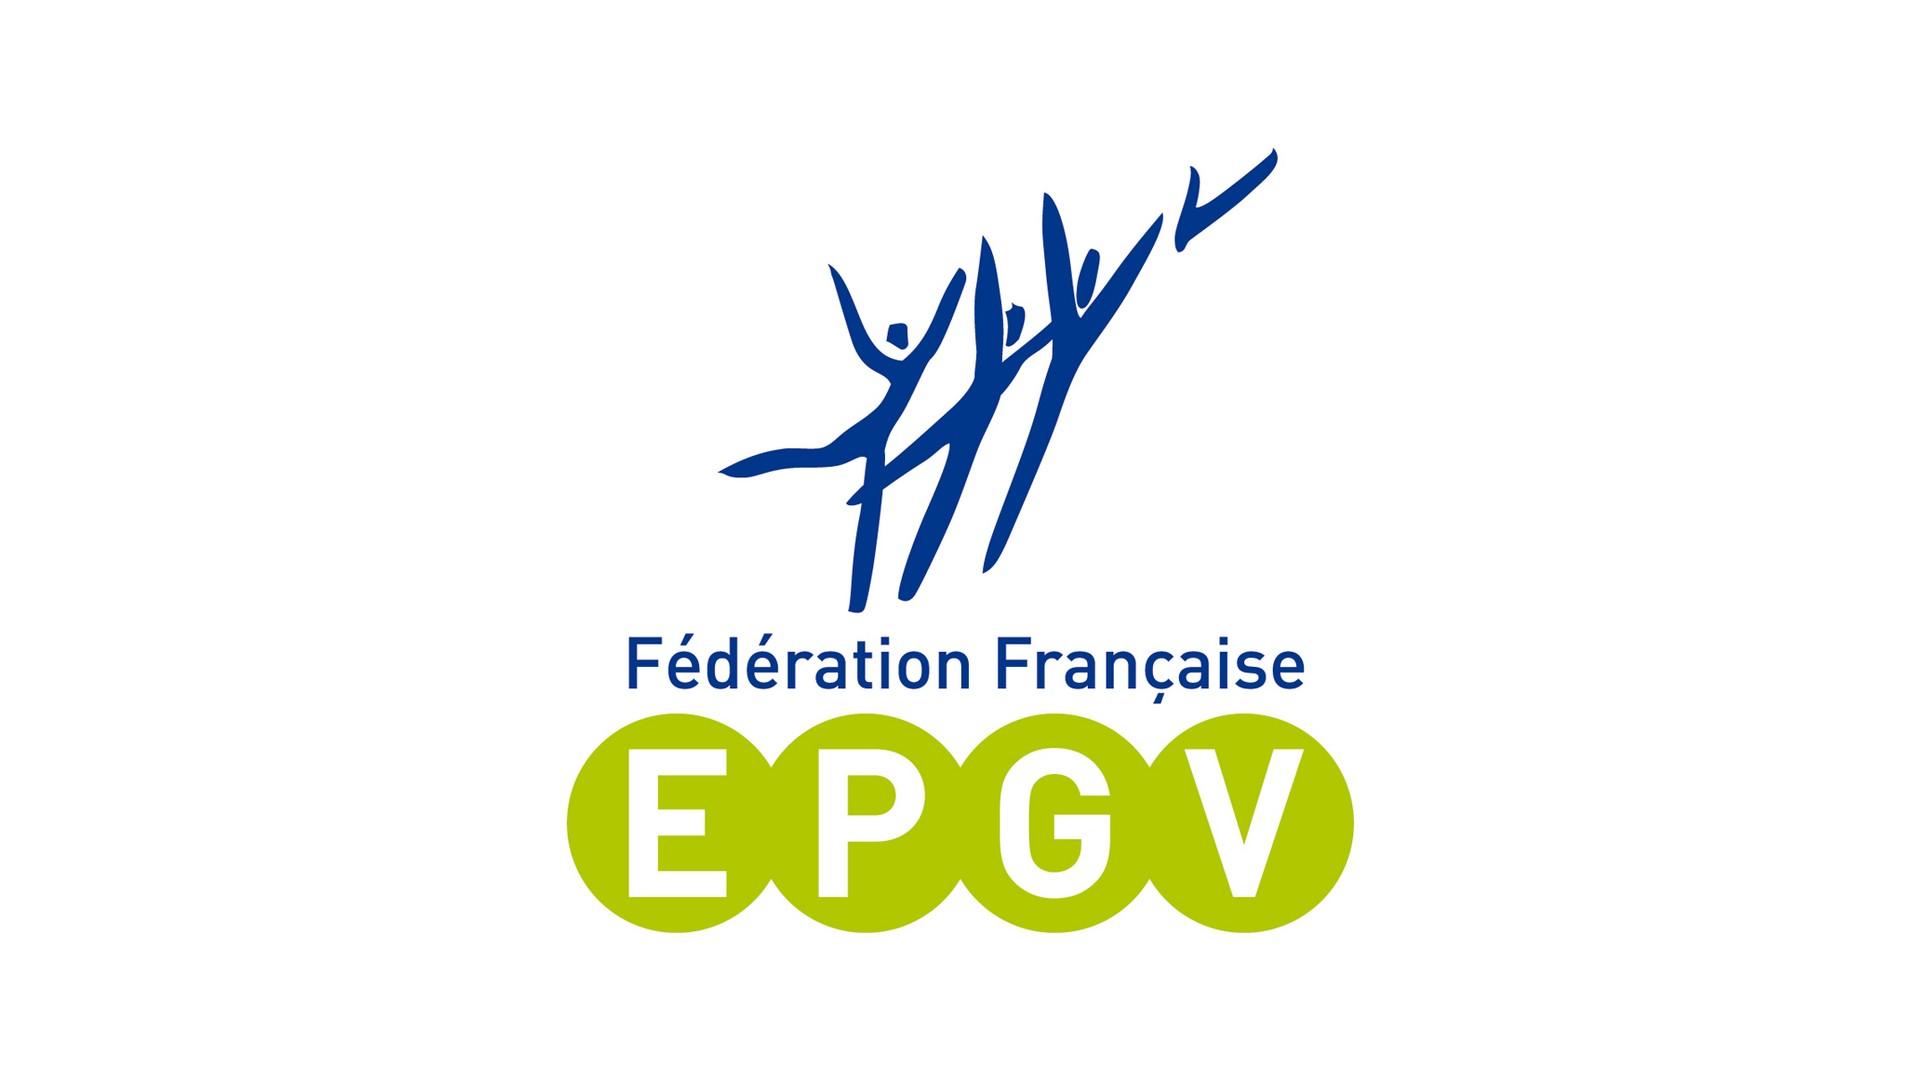 Fédération française EPGV (1) logo FFEPGV